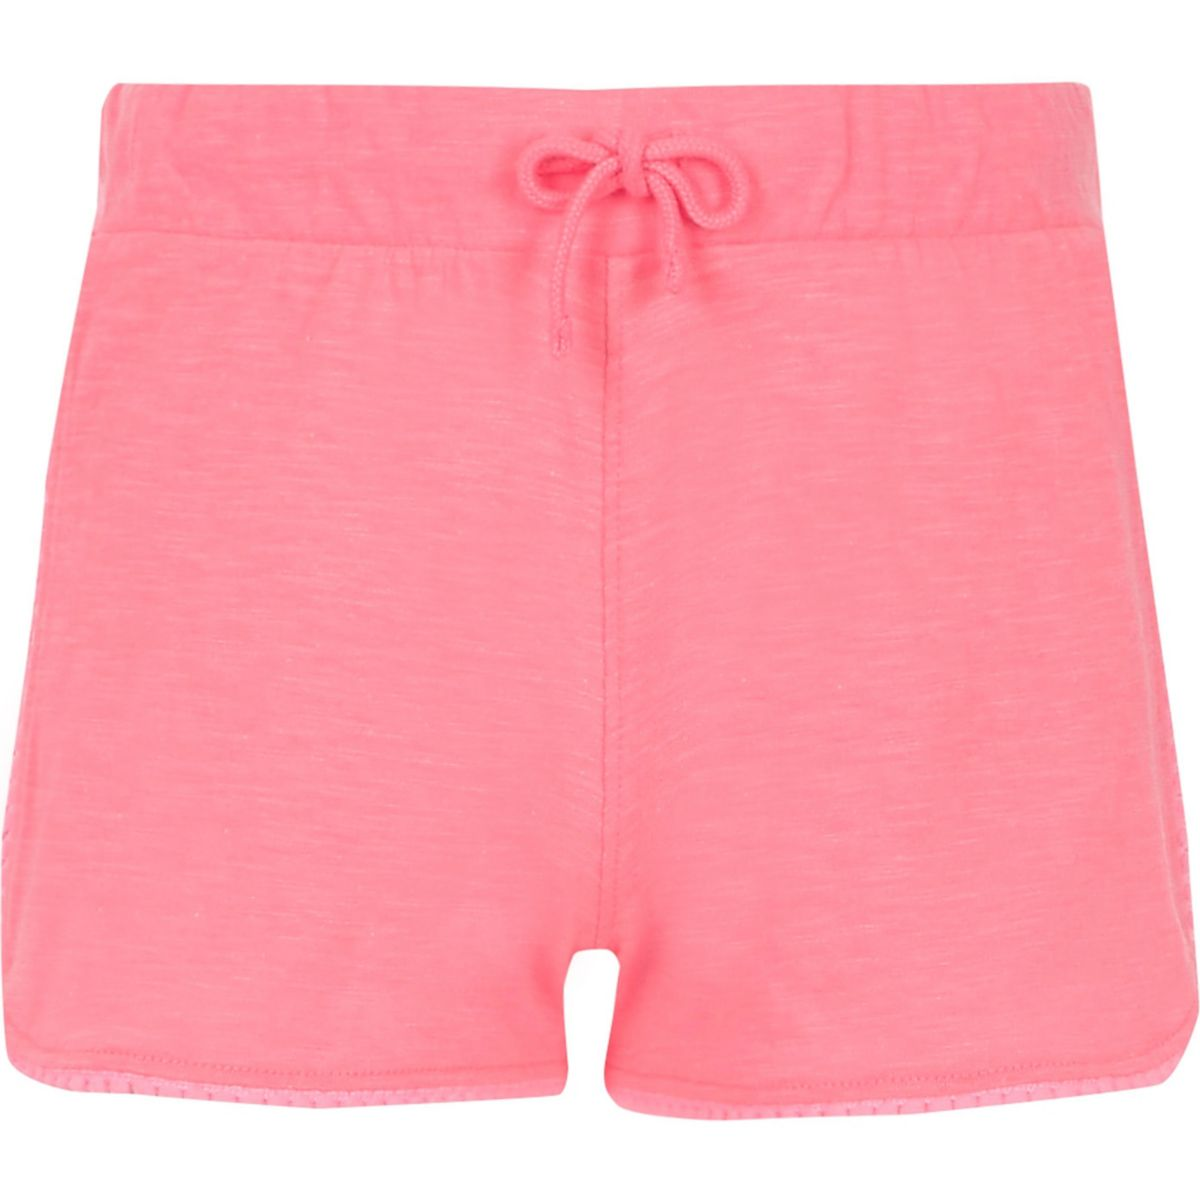 Girls pink fluro lace trim shorts